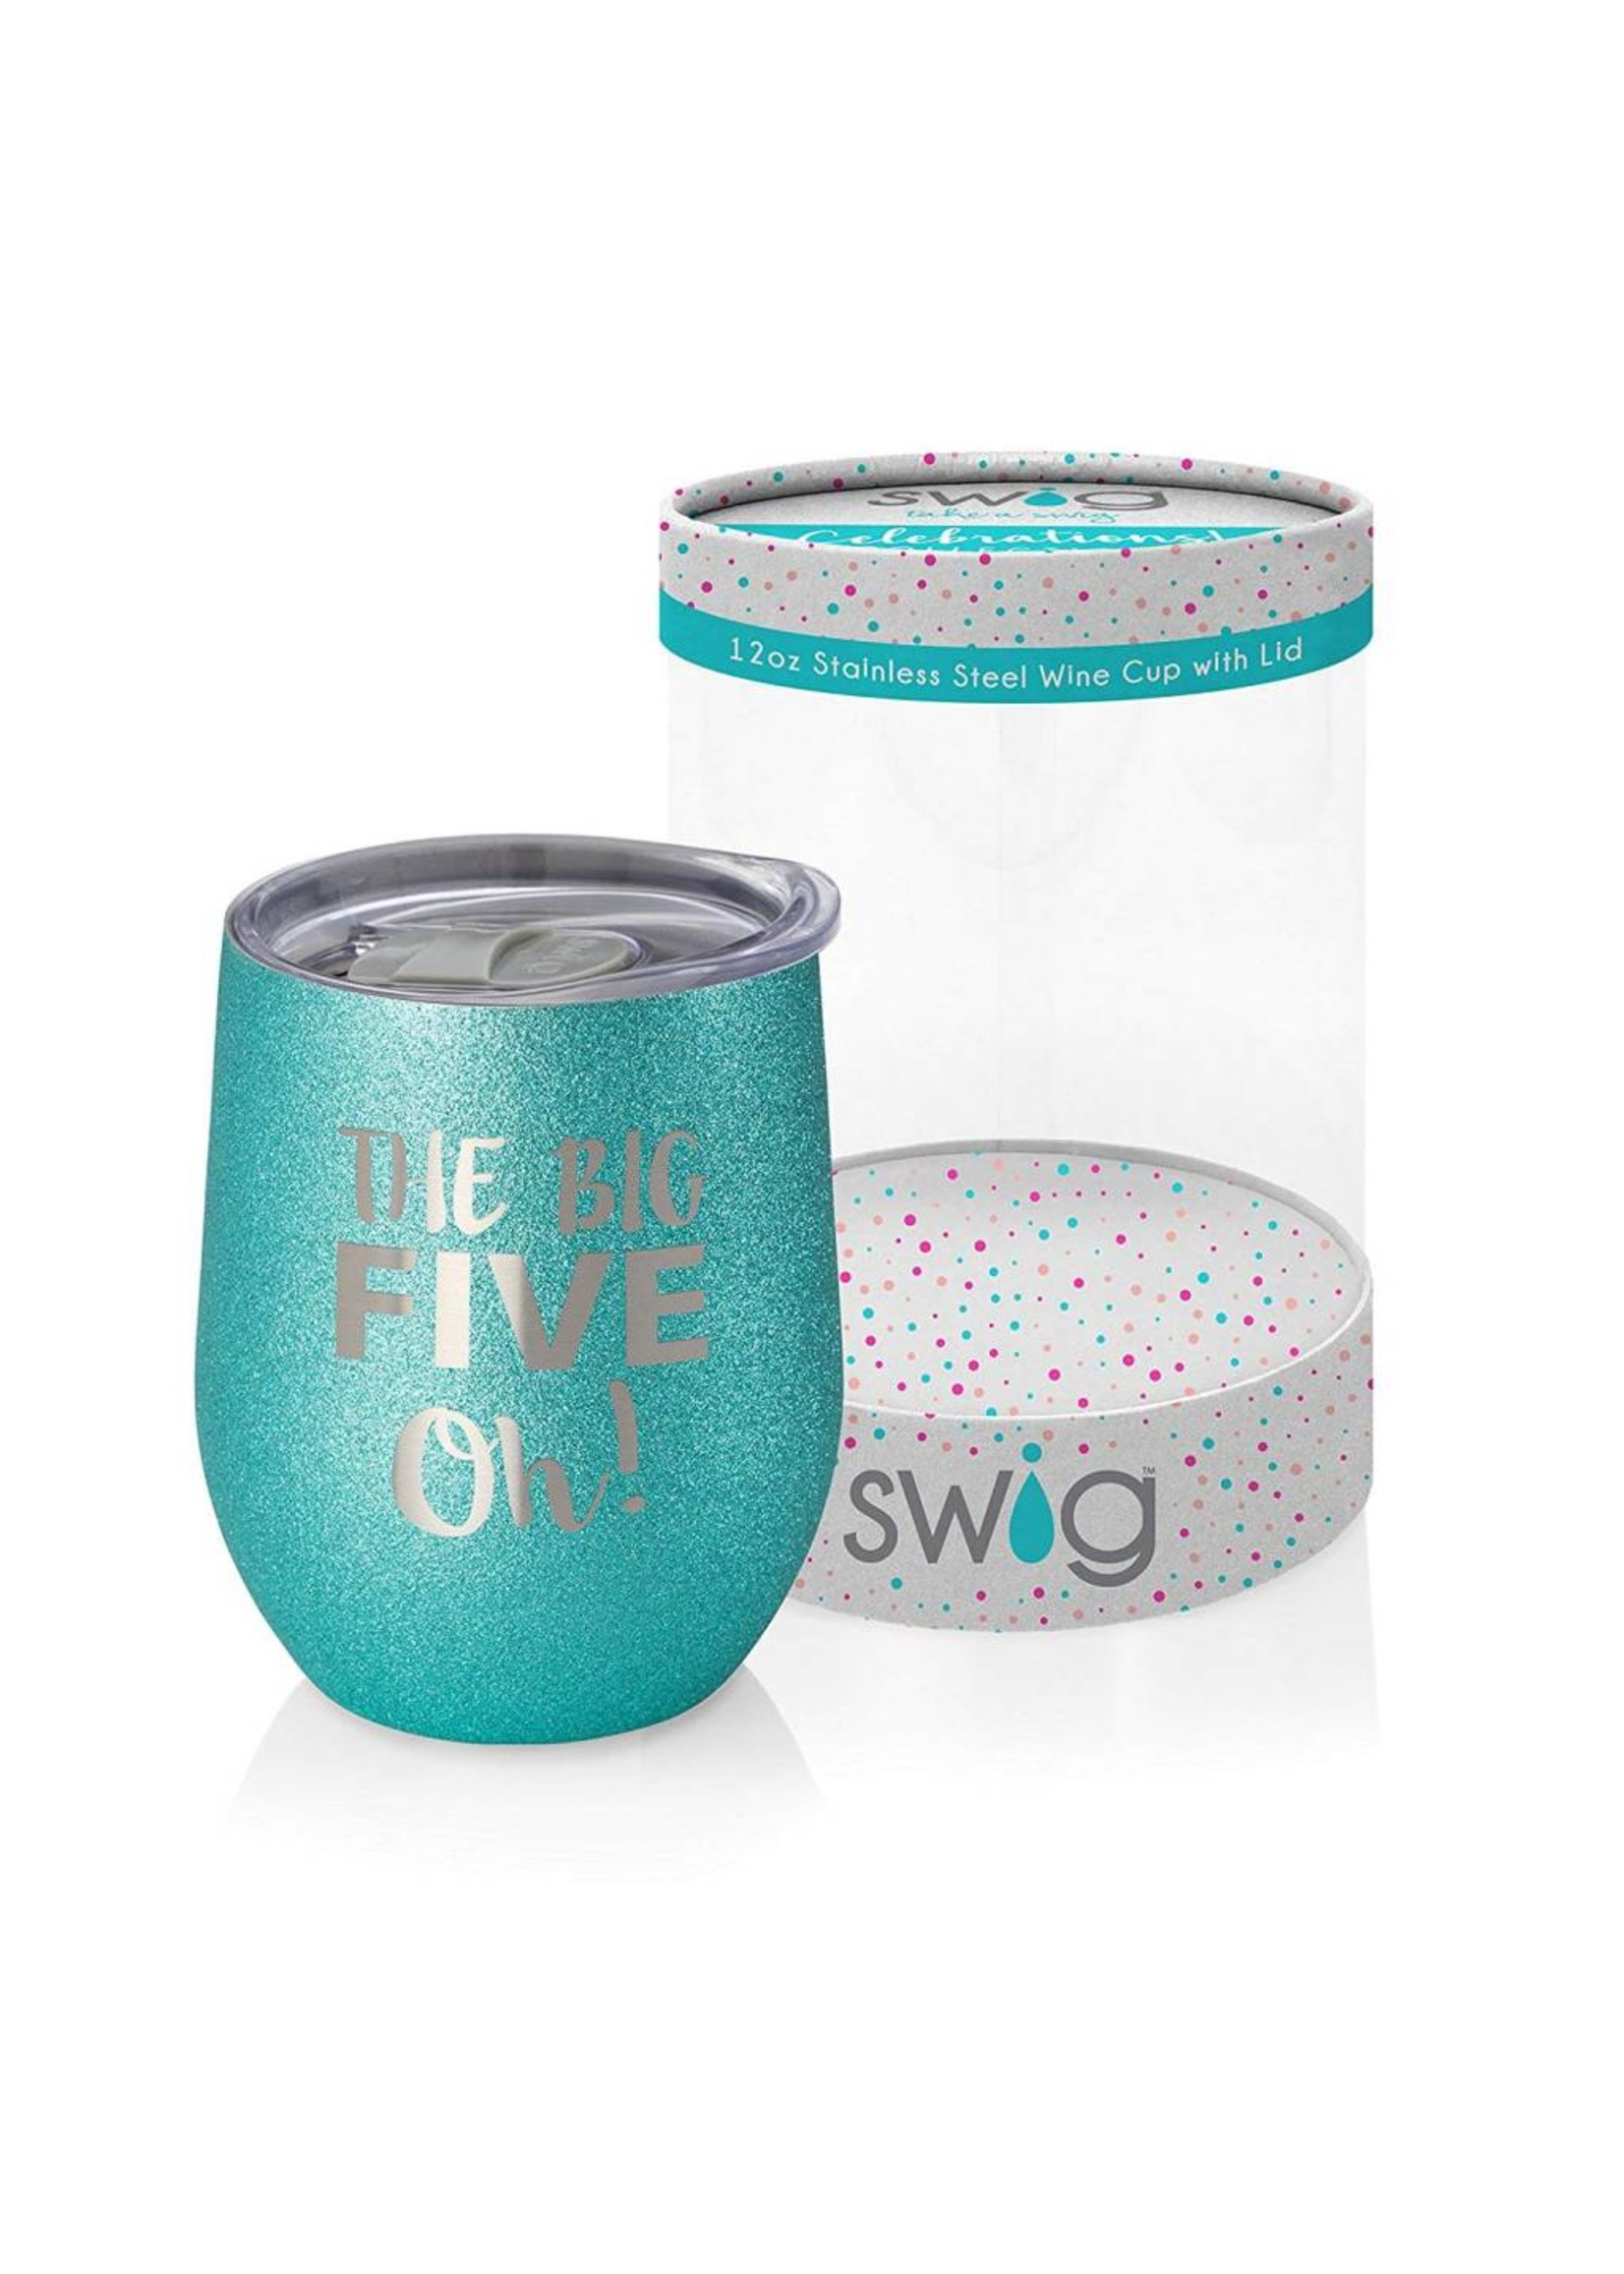 Swig 12 oz Wine the Big Five OH!